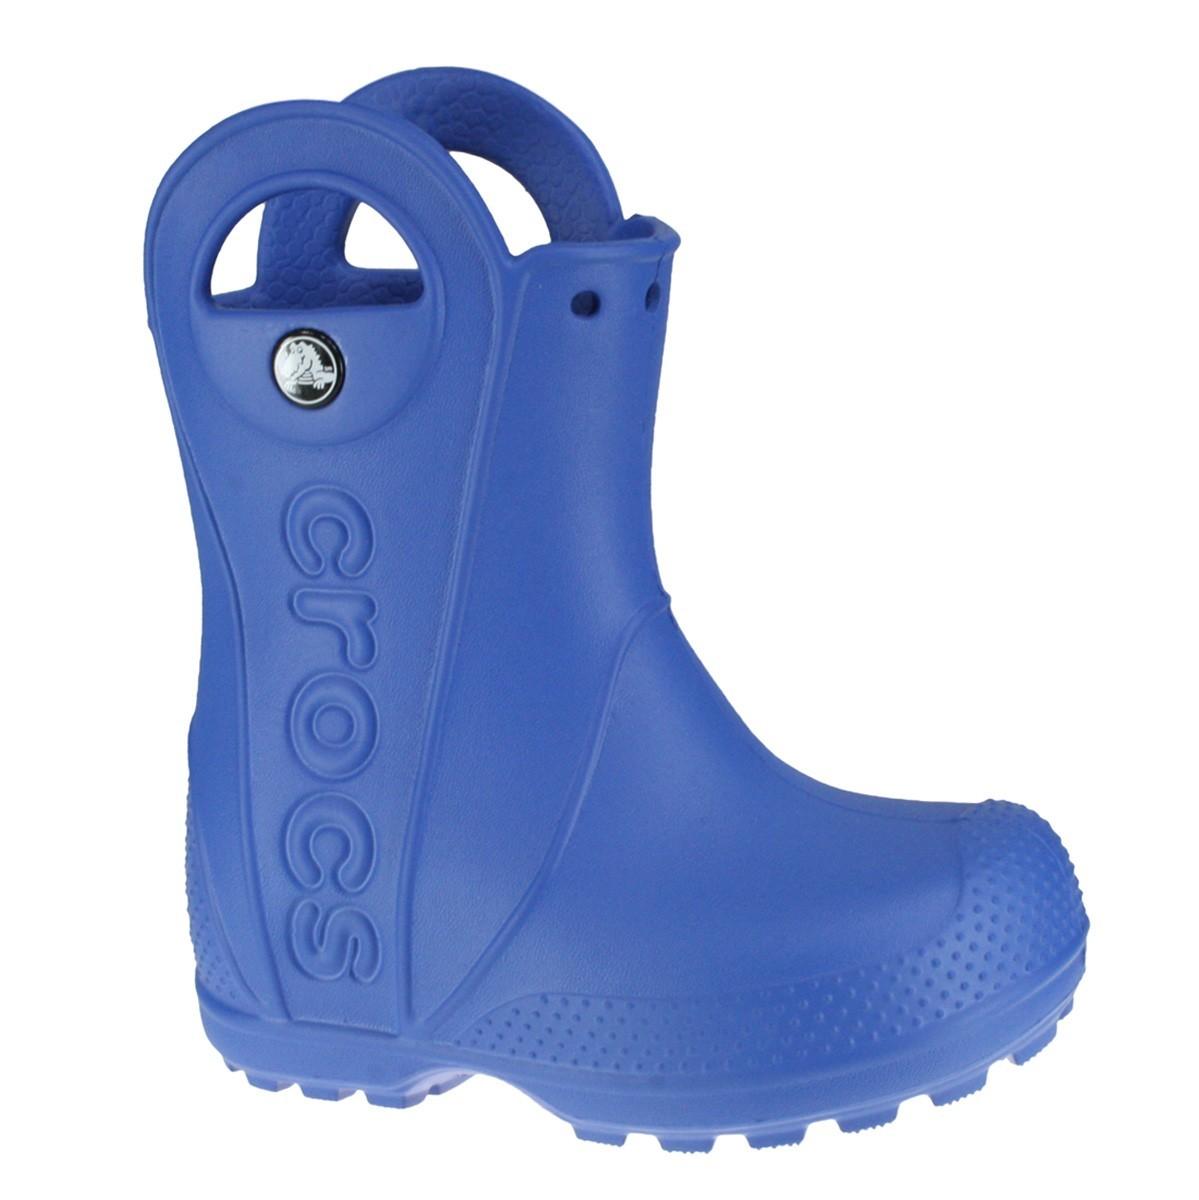 bc63be5c2c3 Bota Crocs Handle it Rain Infantil 12803 - Azul - Botas Online ...